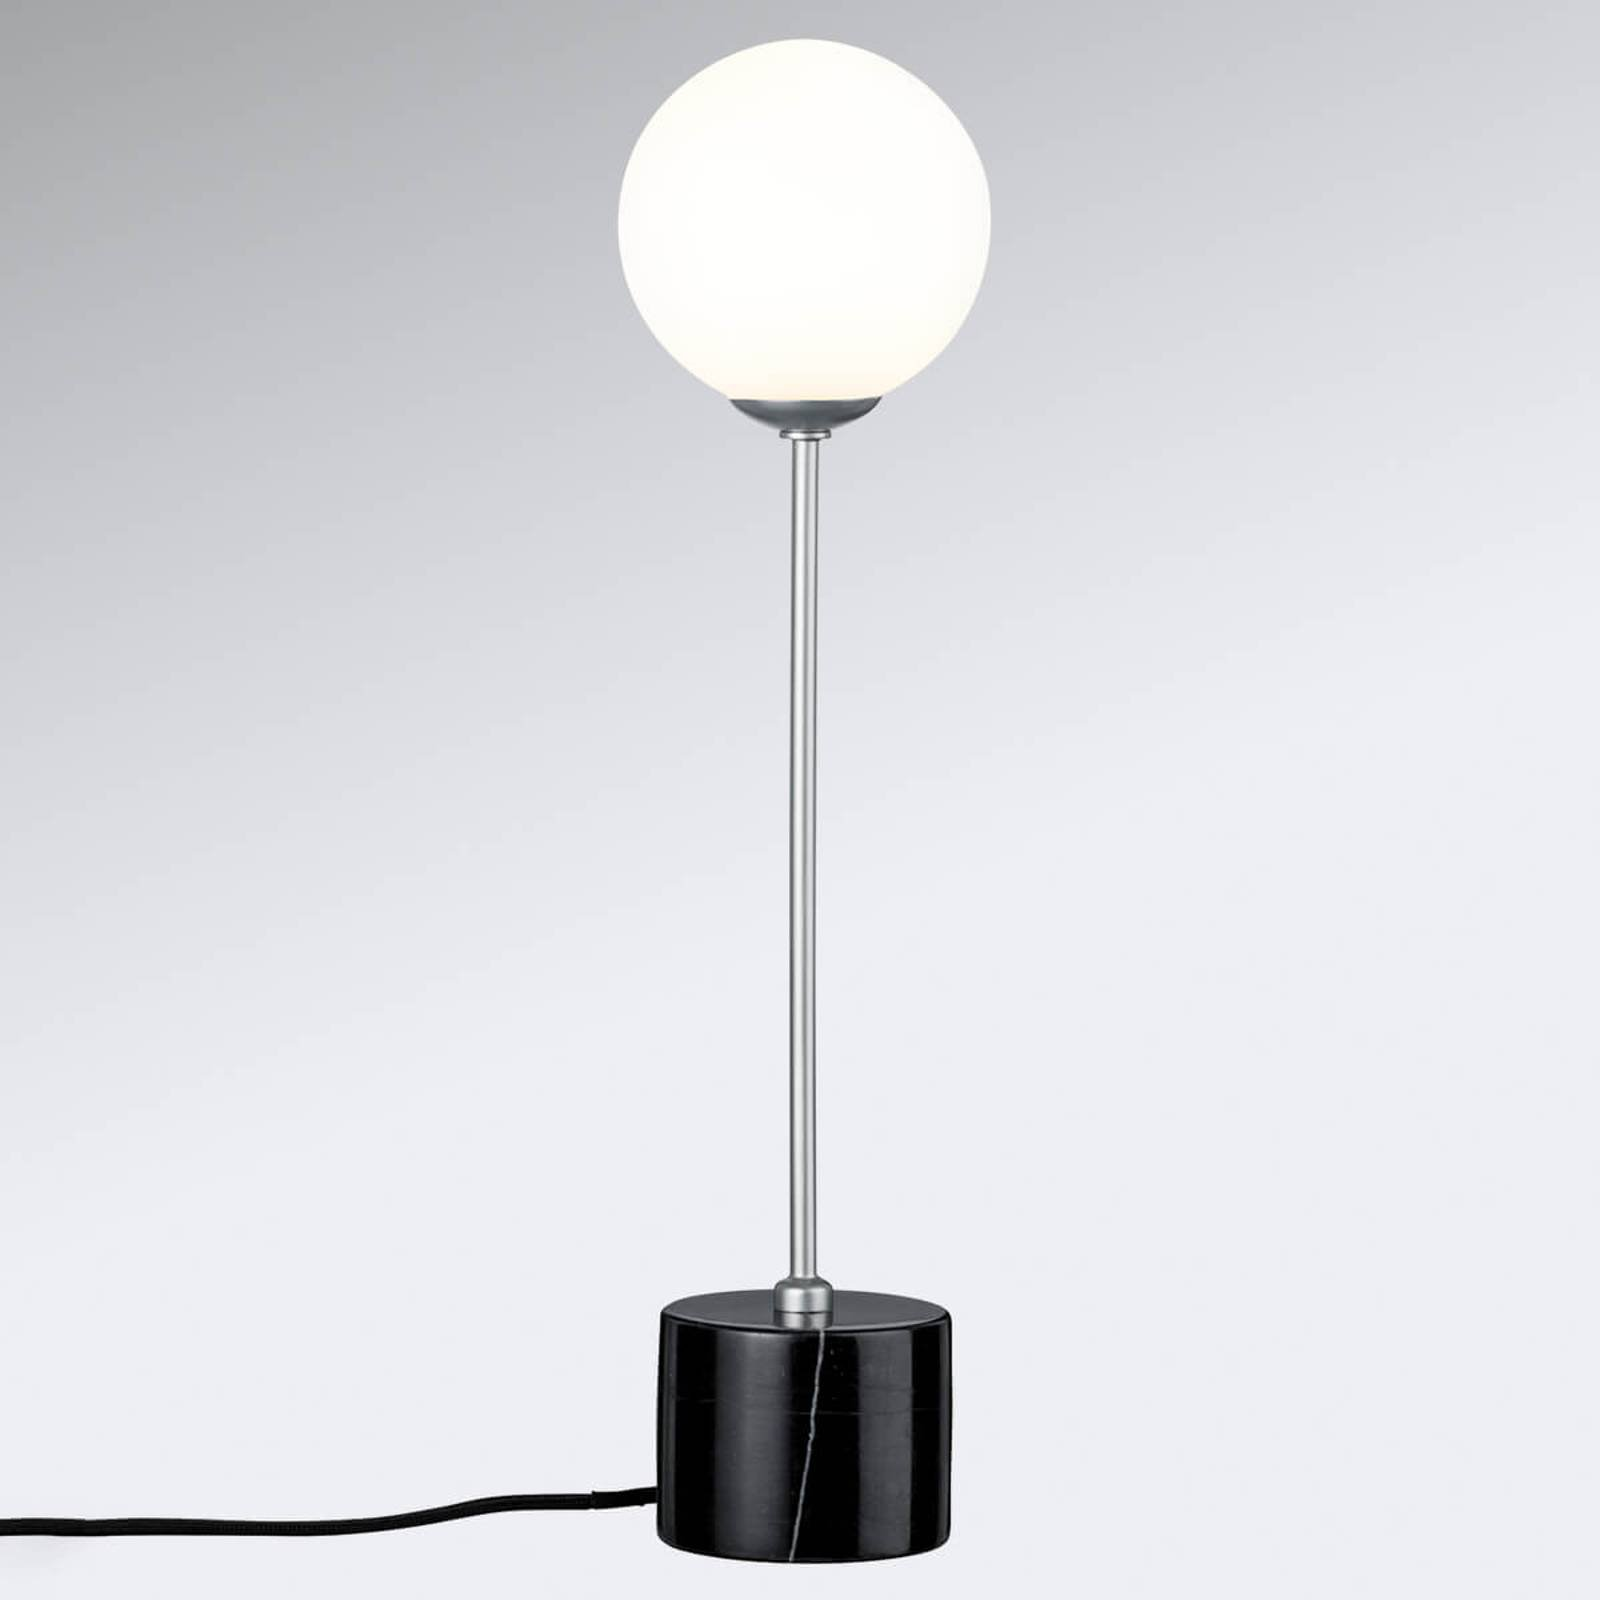 Bordlampe Moa i elegant design